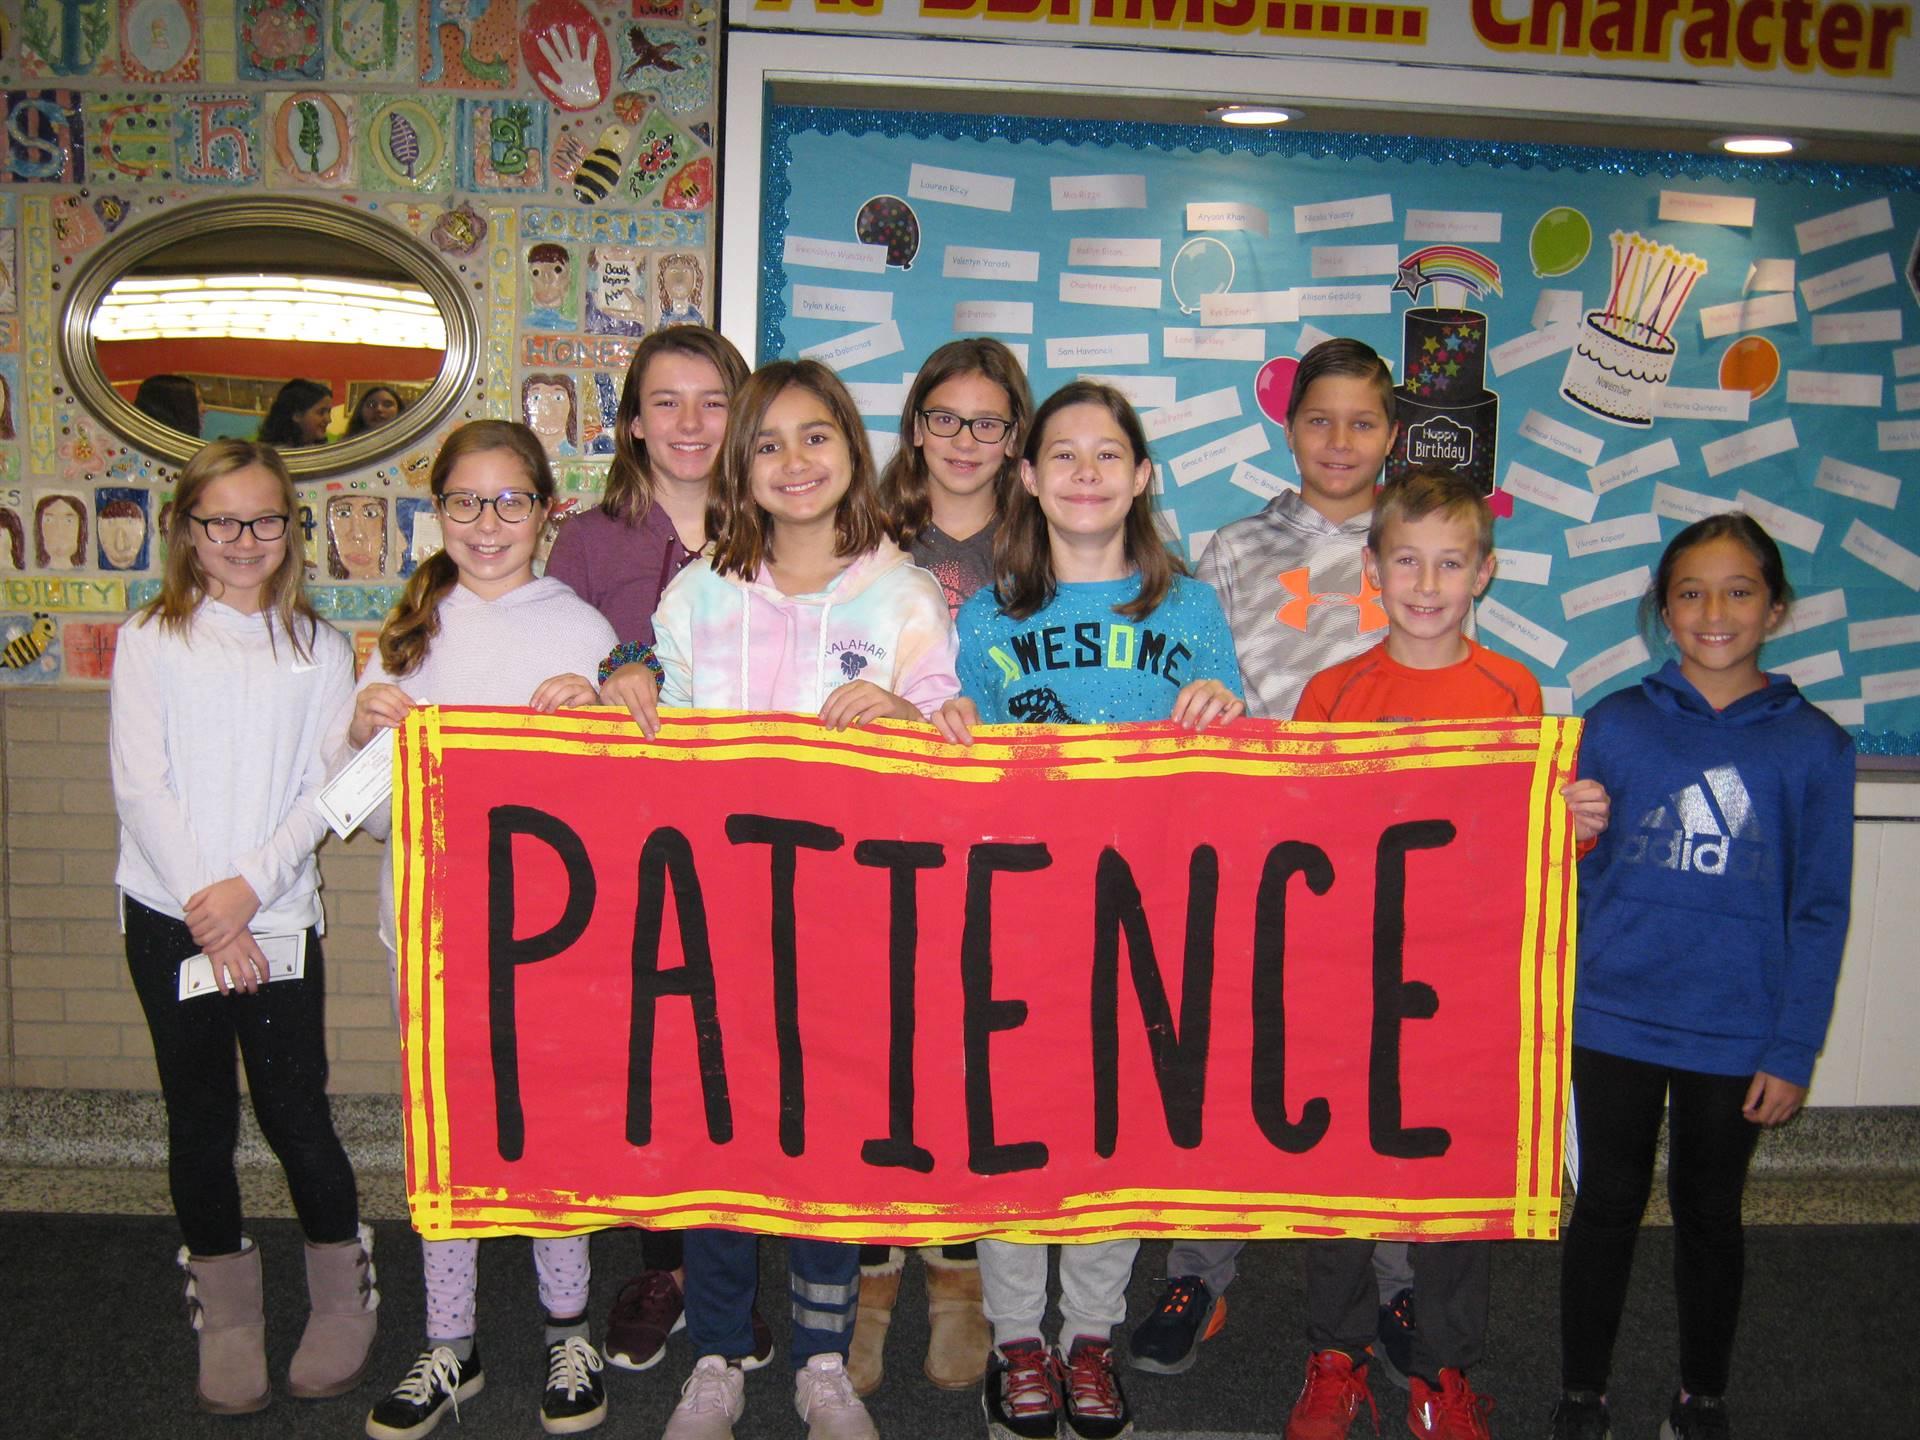 Patience theme